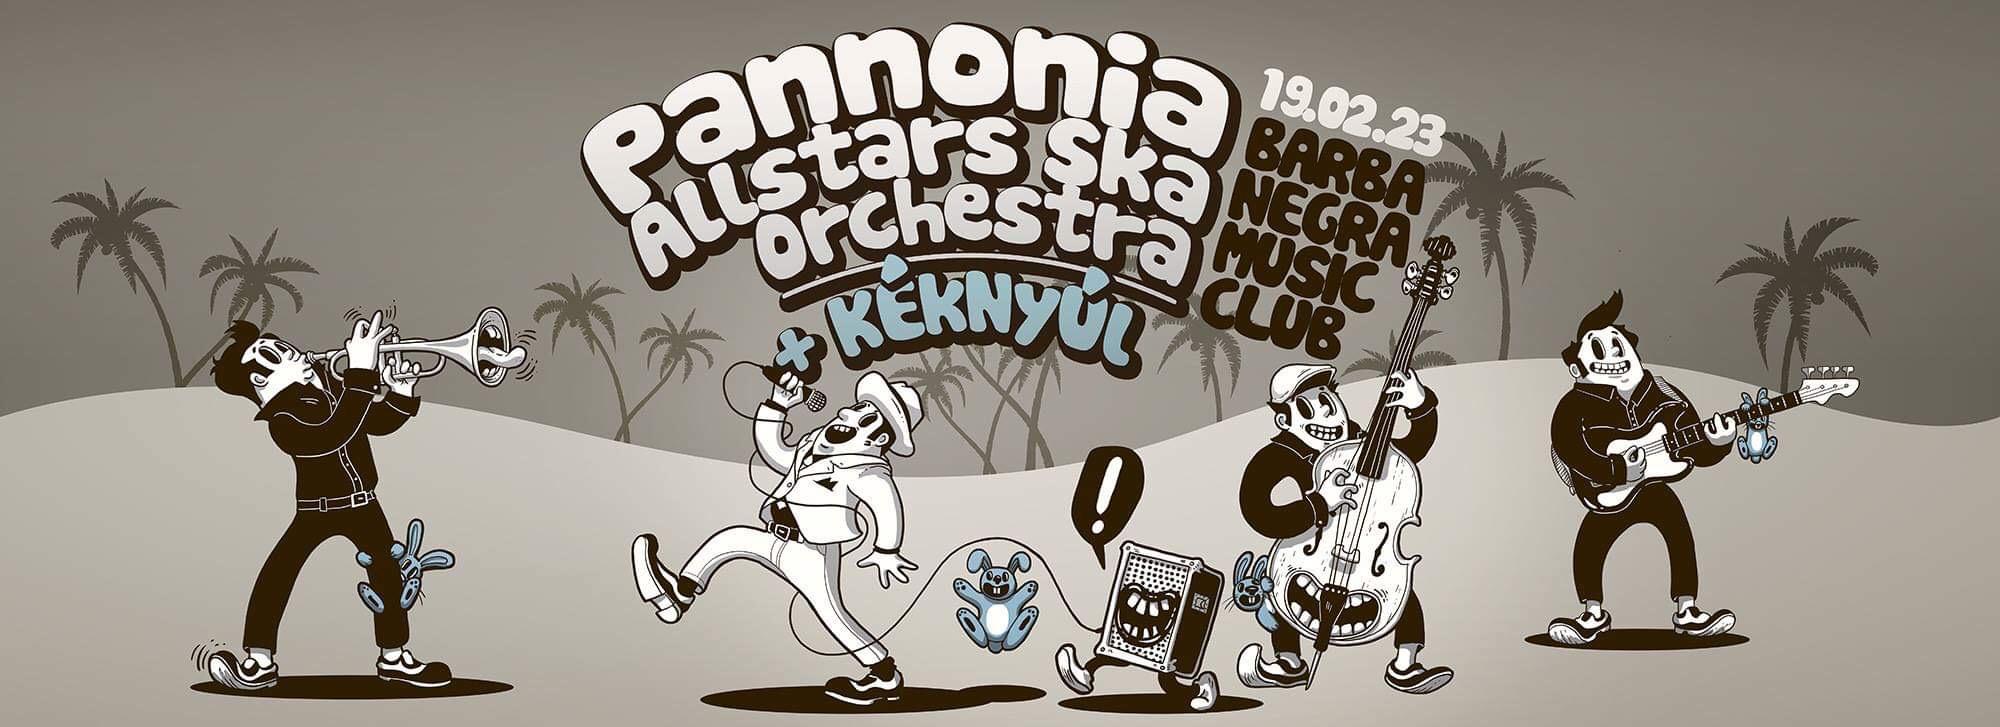 Pannonia Allstars Ska Orchestra | Kéknyúl